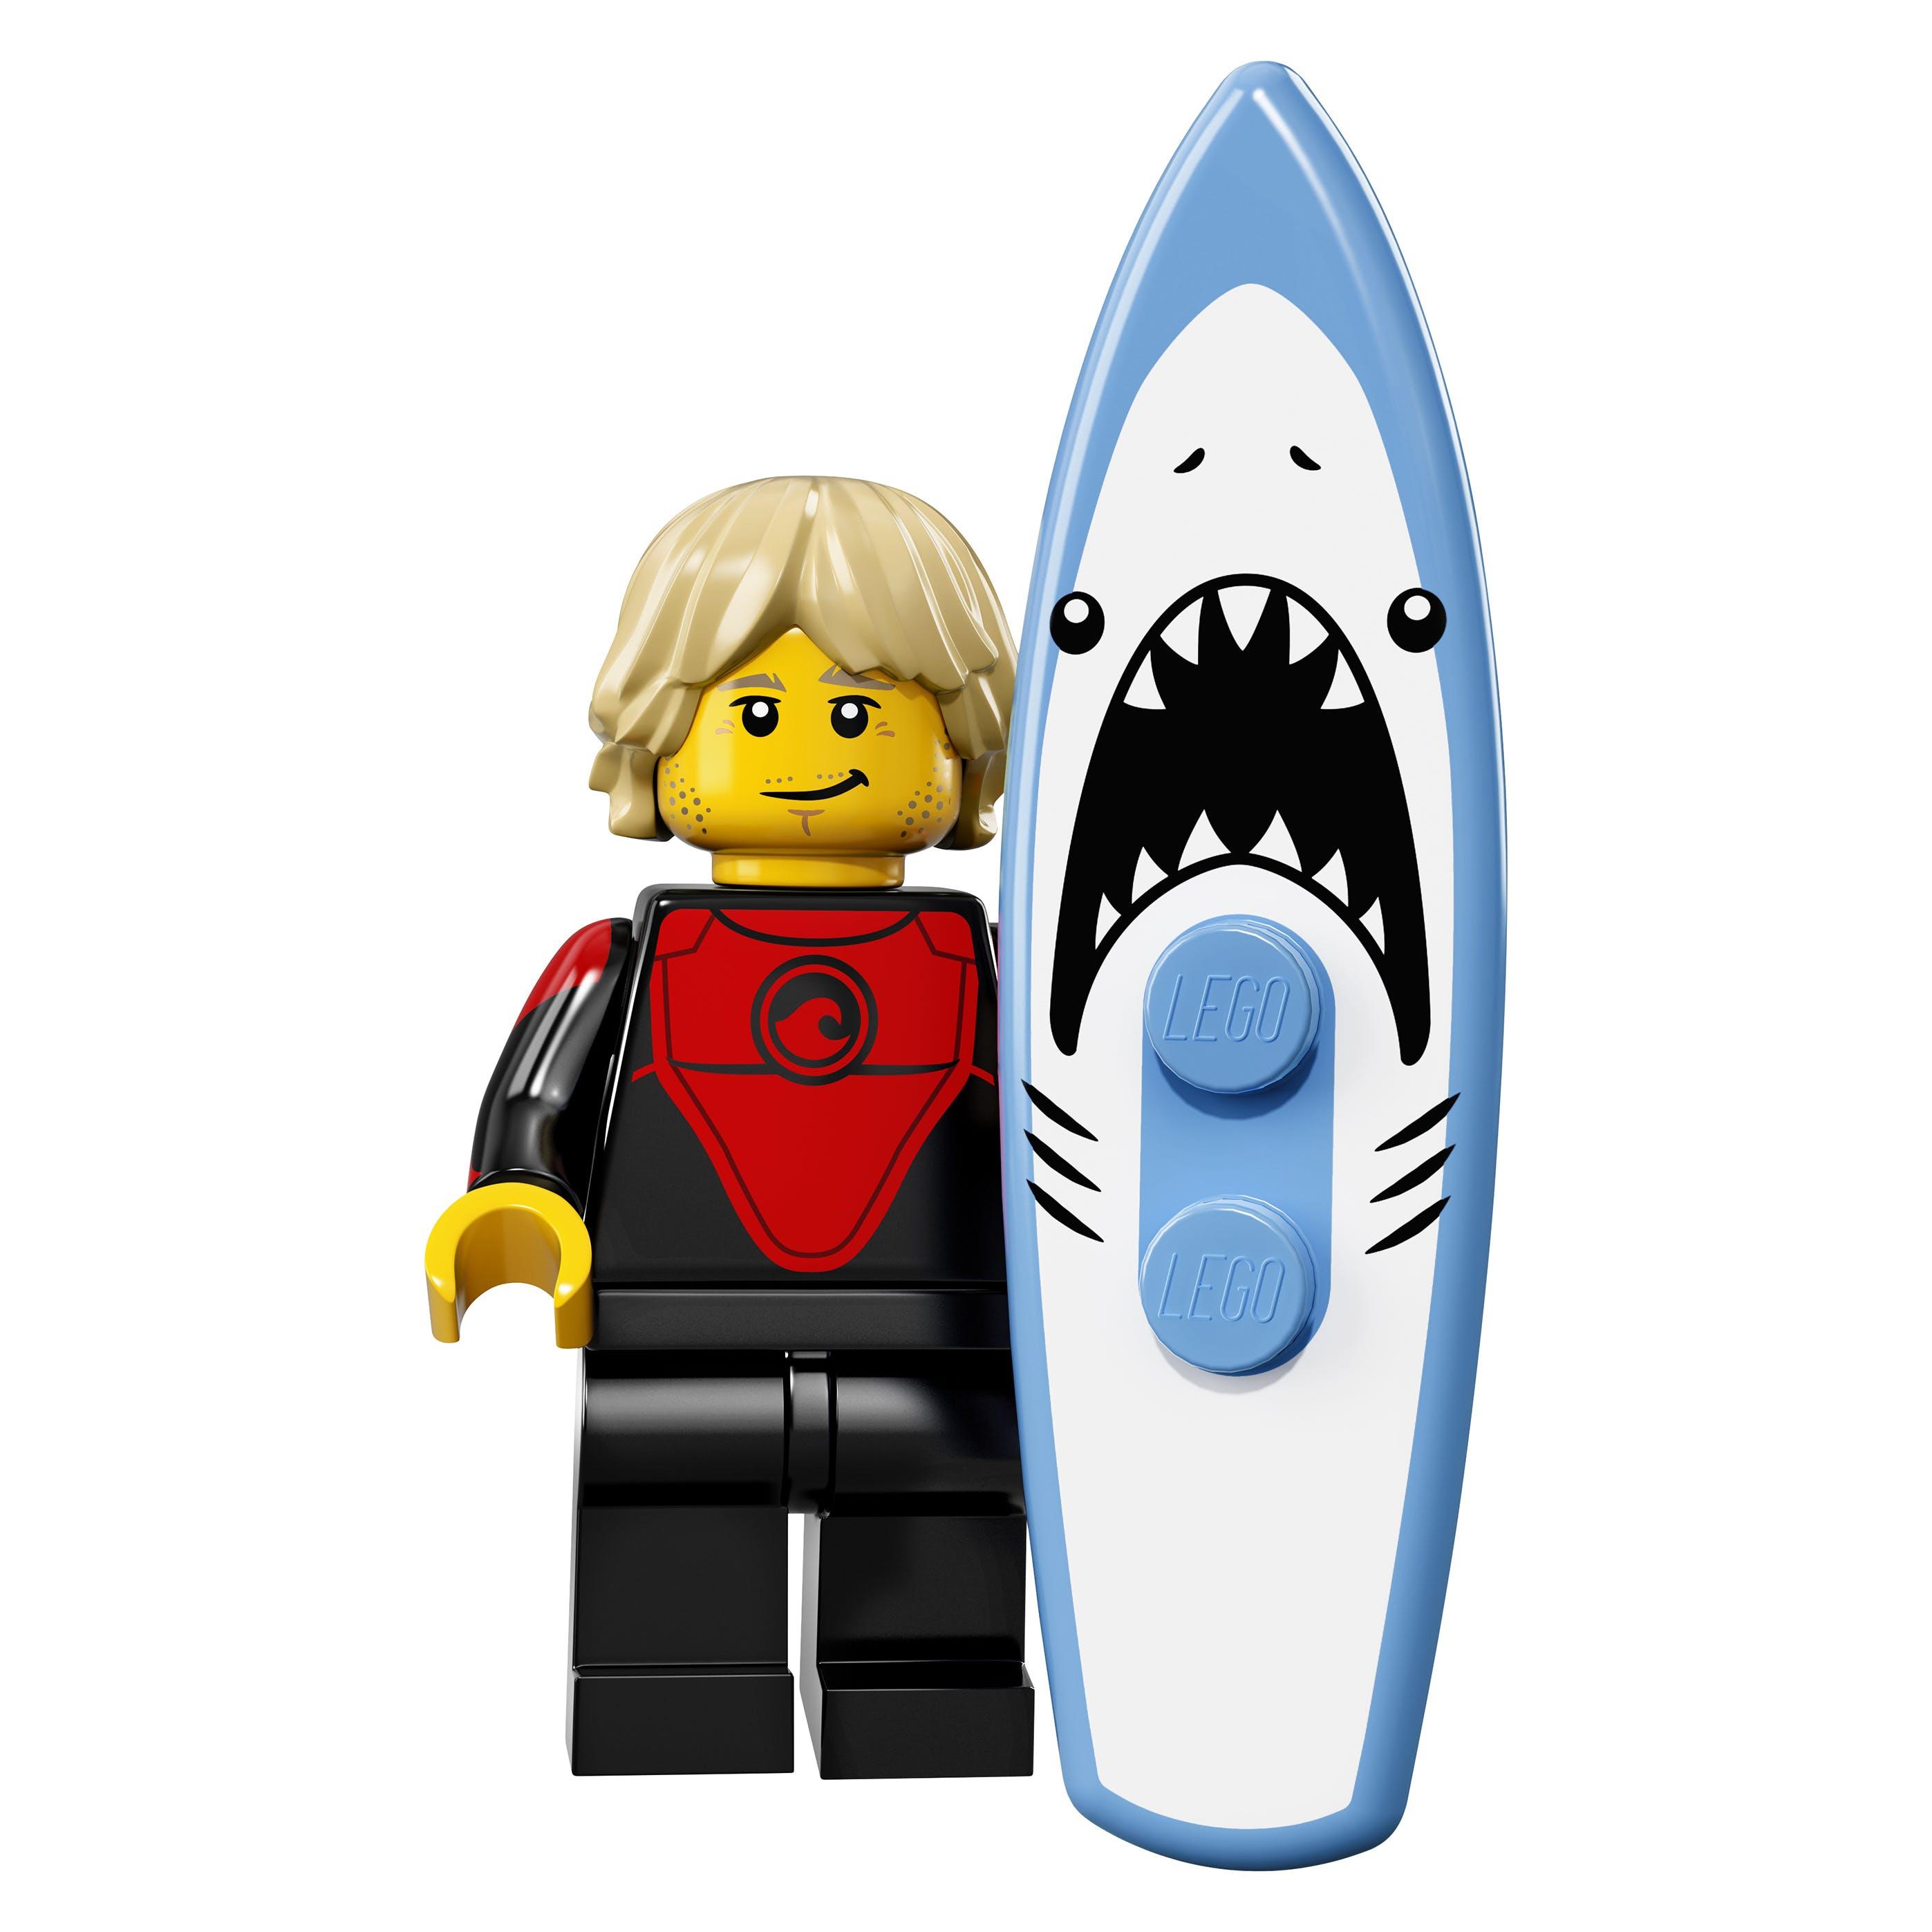 LEGO minifgs series 17 Pro Surfer